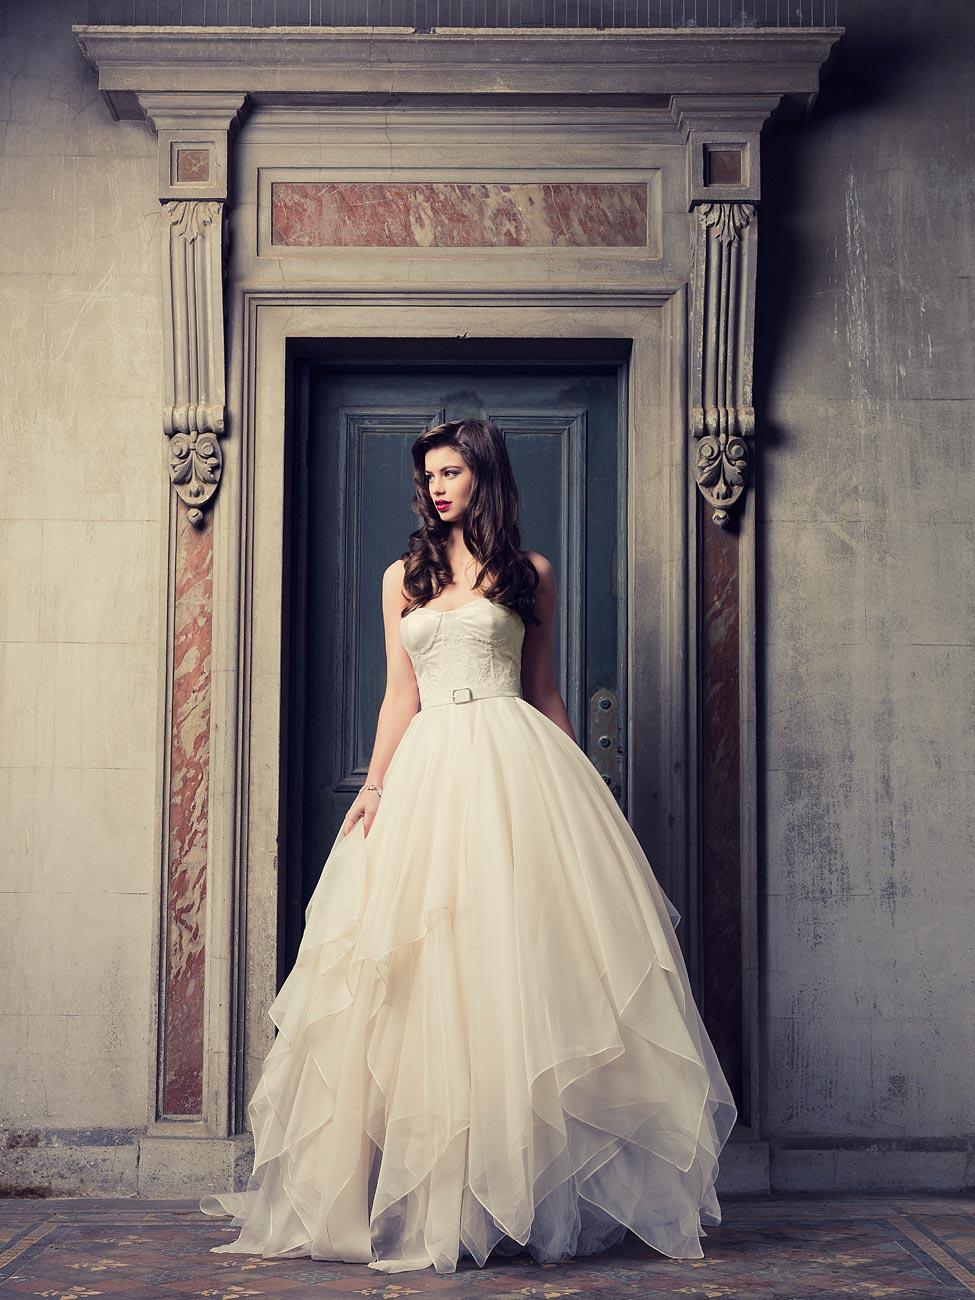 completewedding-fashion-editorial-2d.jpg